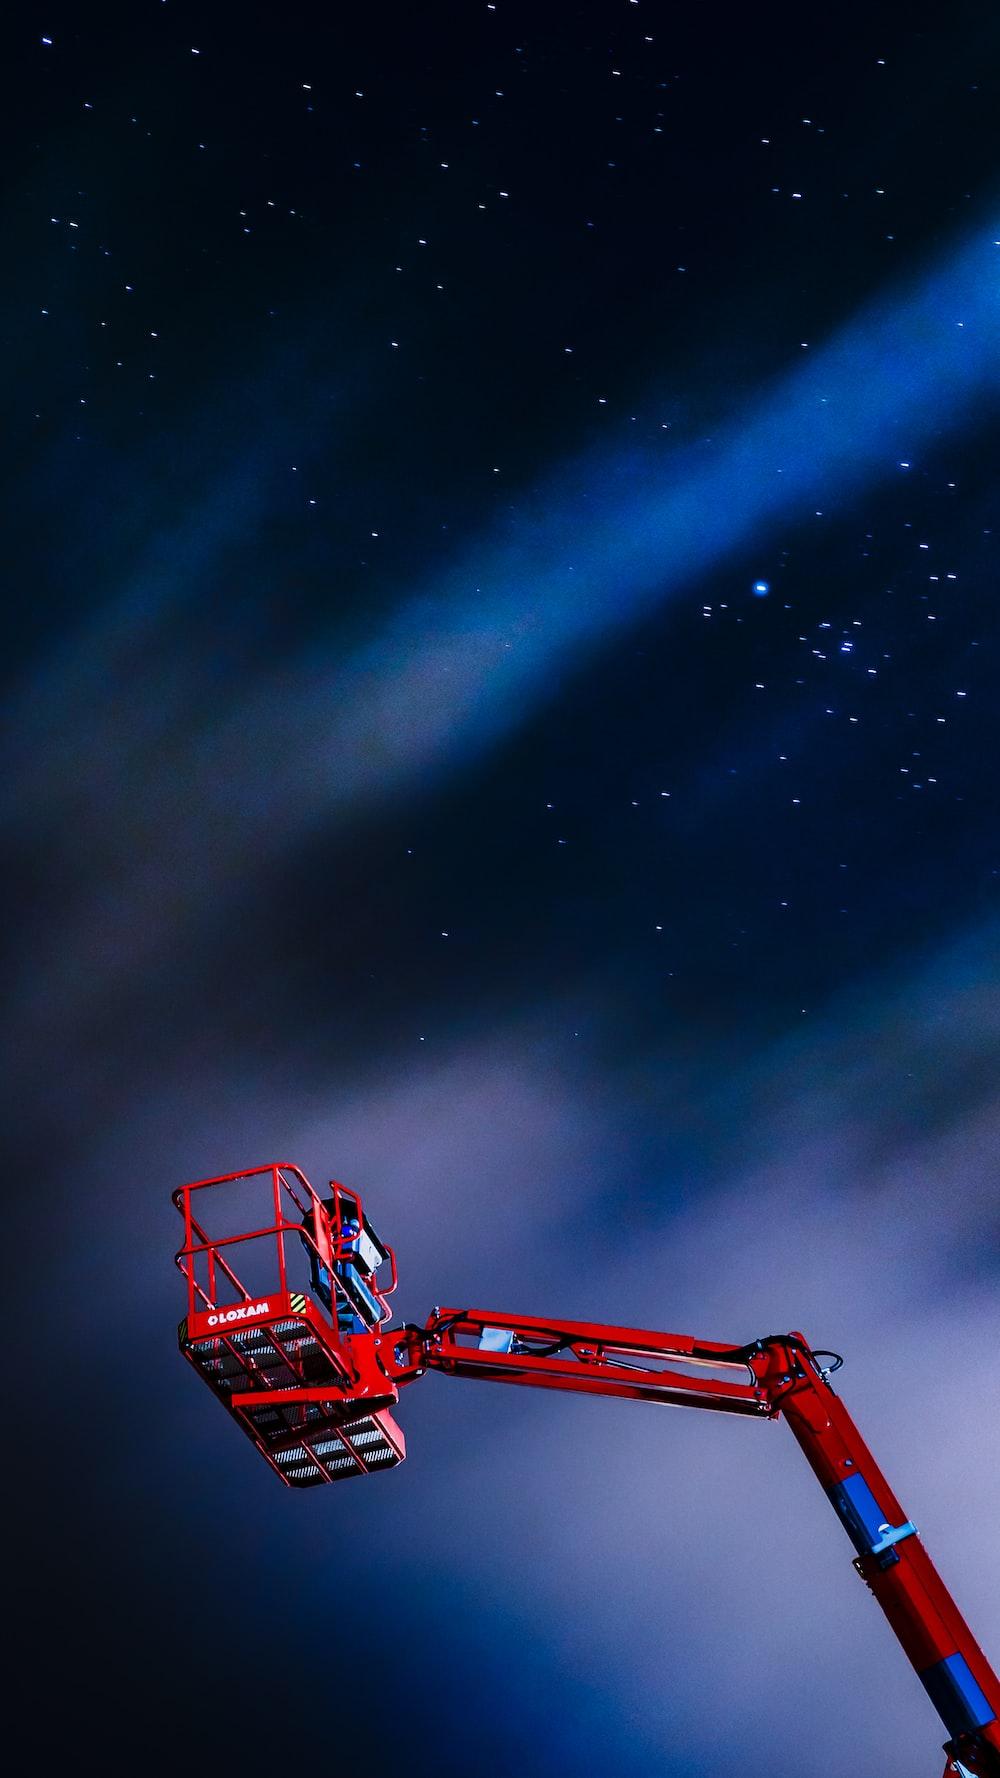 red man lift under starry night